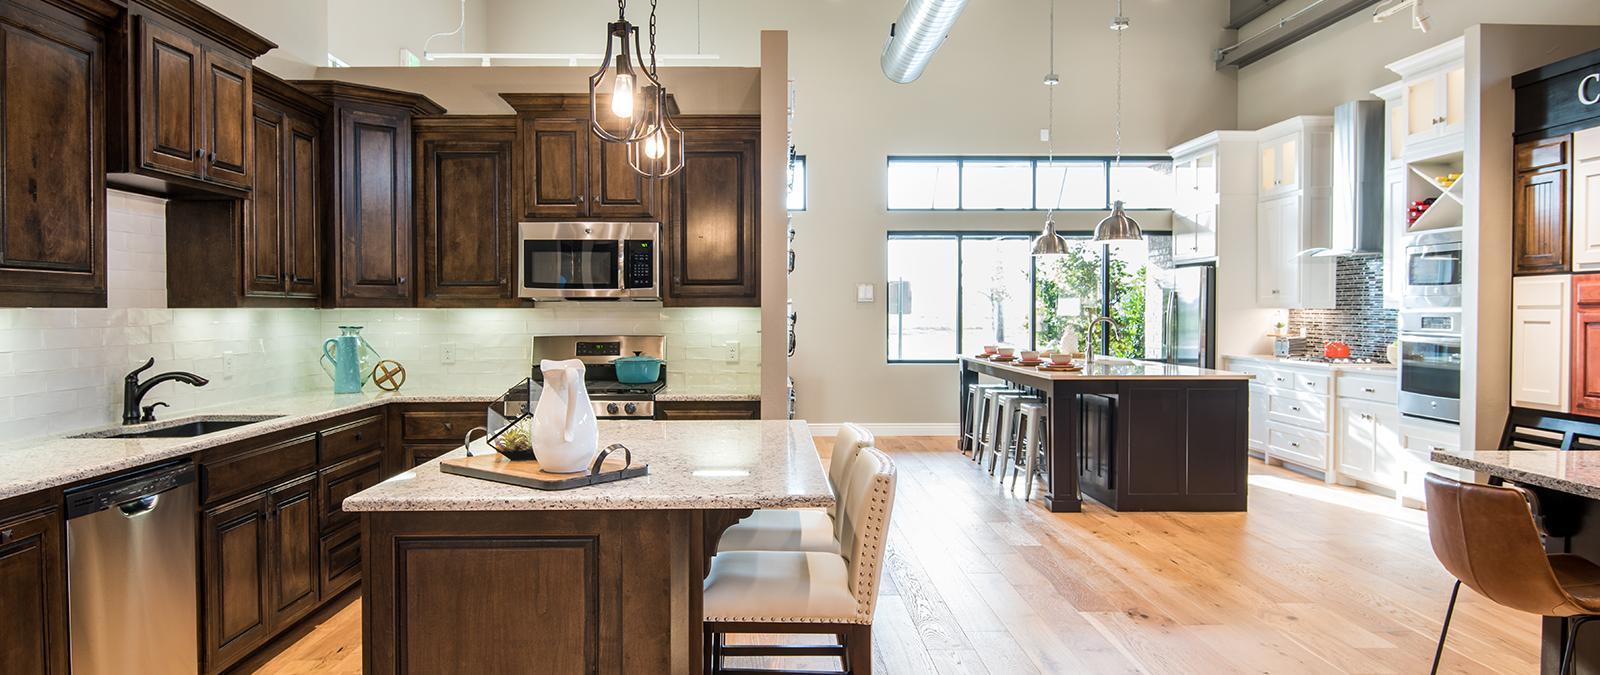 Home Builders in OKC | Mashburn Faires | New Homes OKC